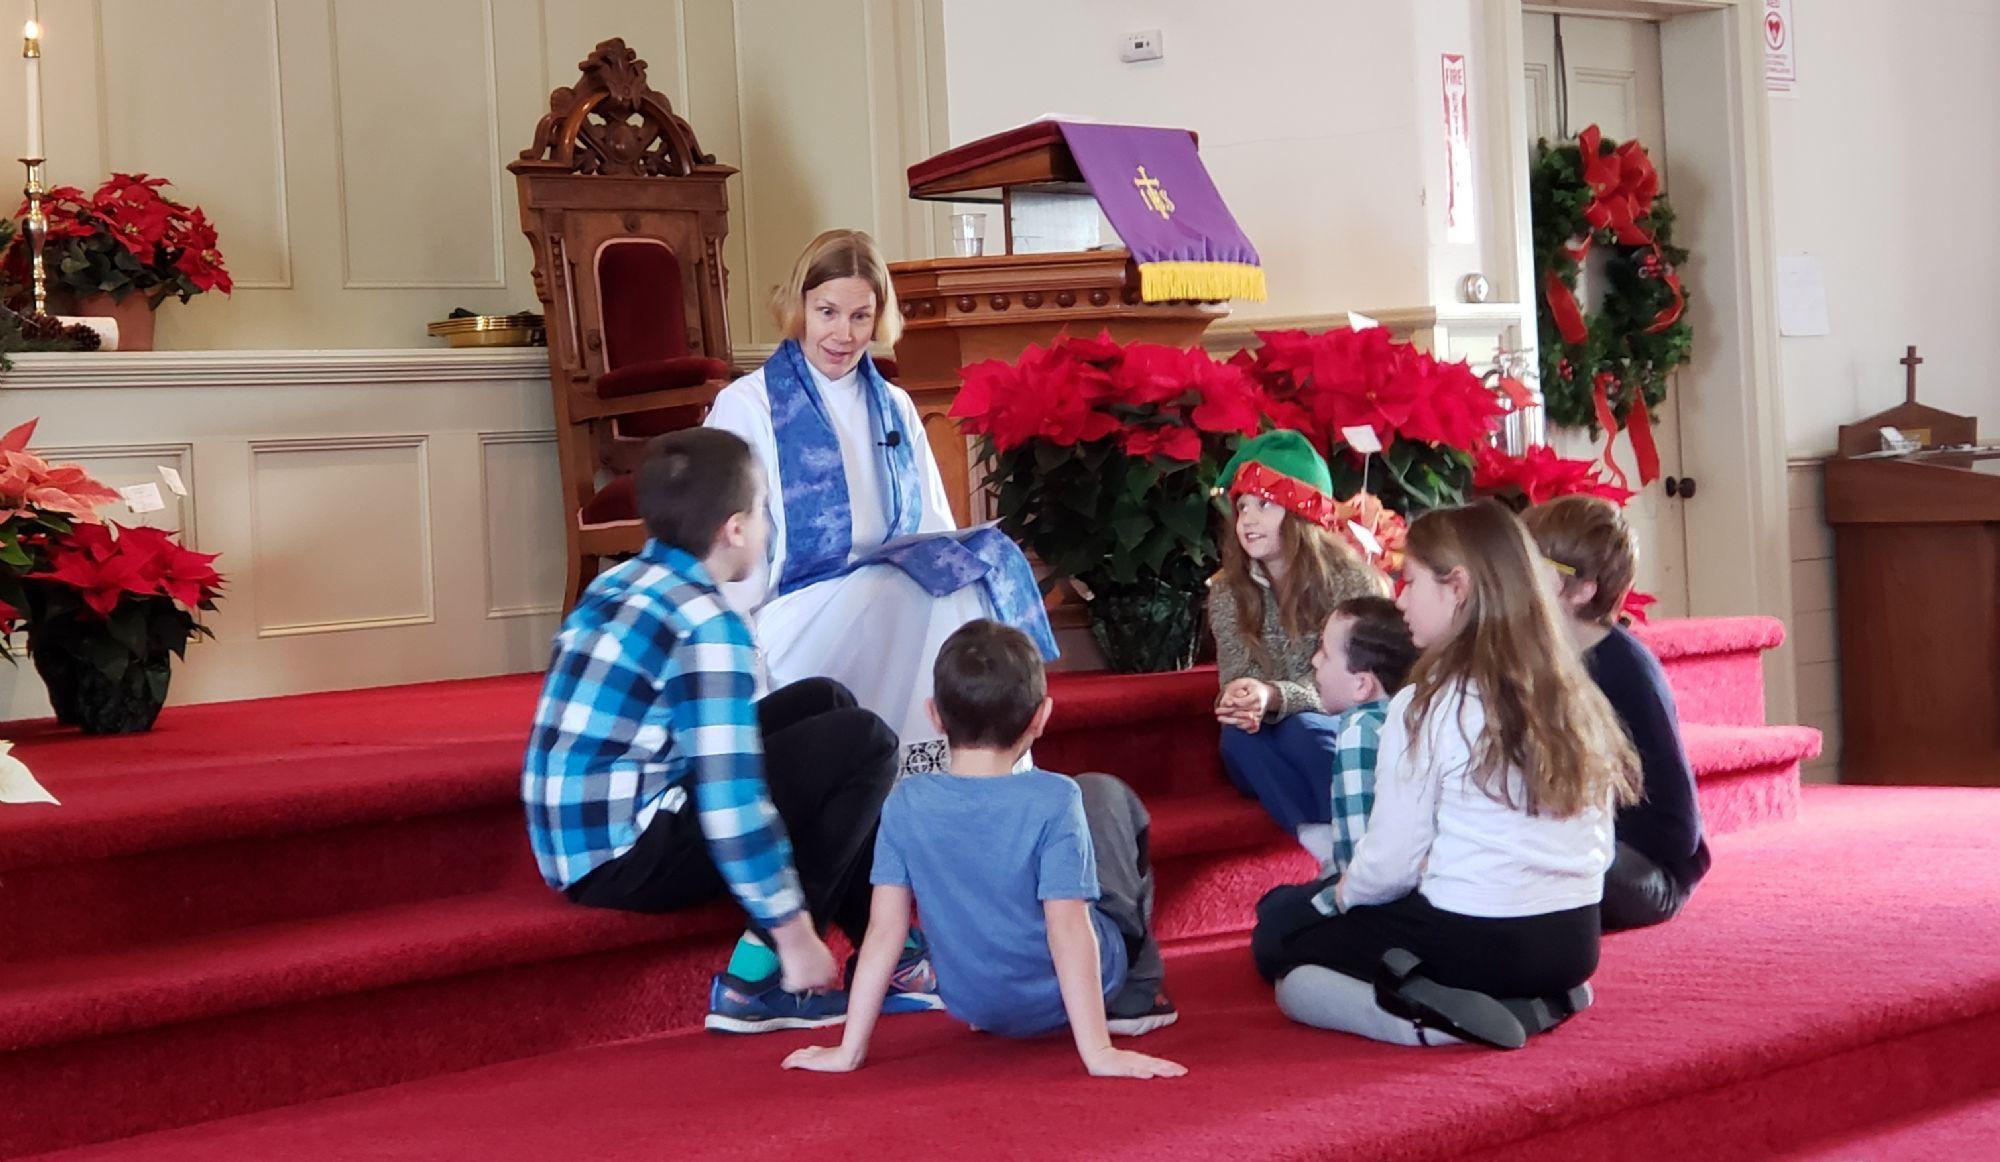 Pastor Kathy